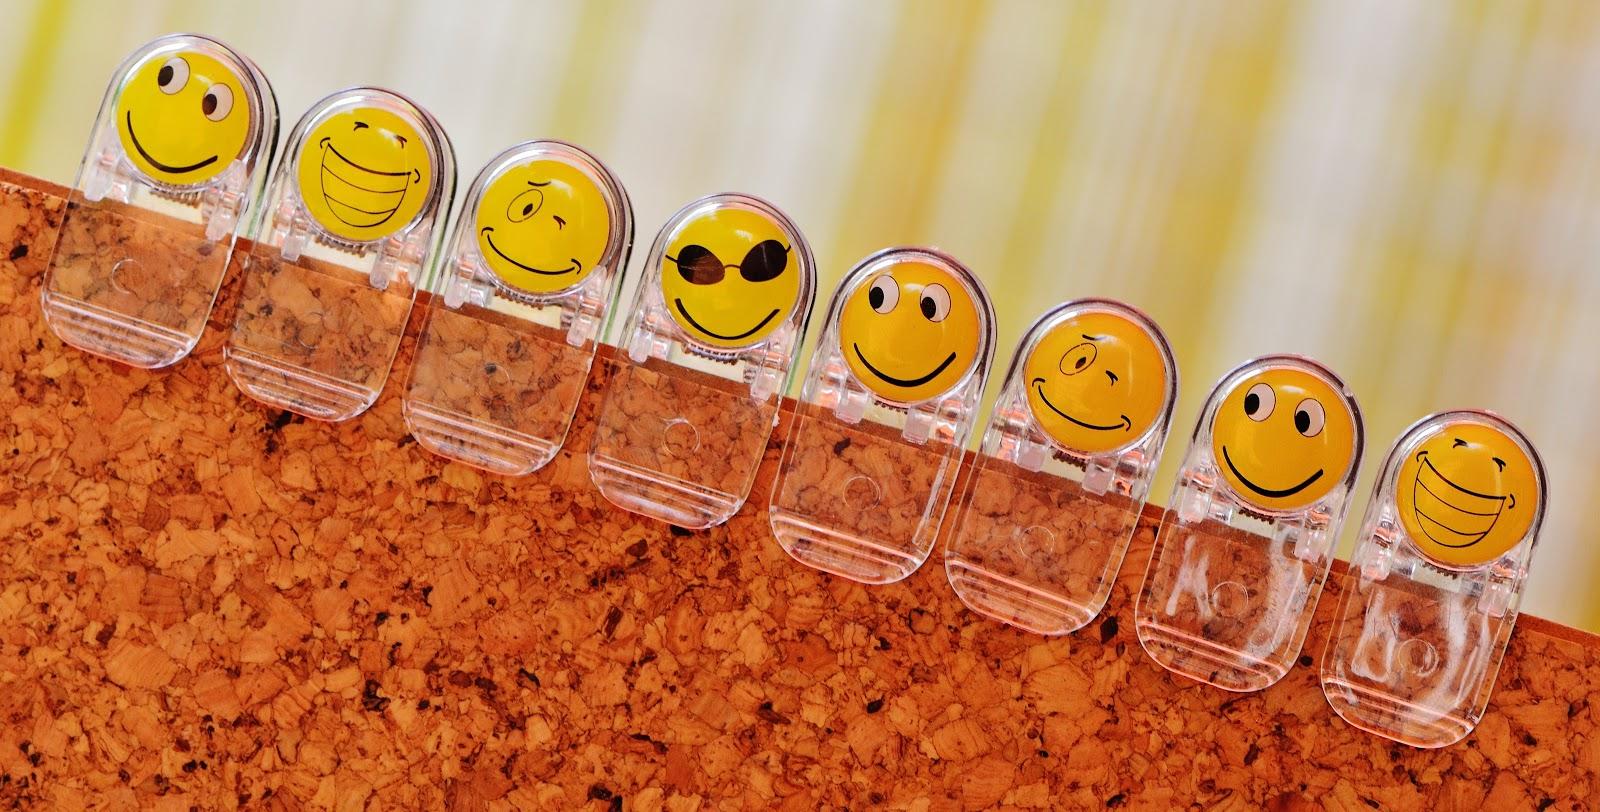 Emotions affect customer relations